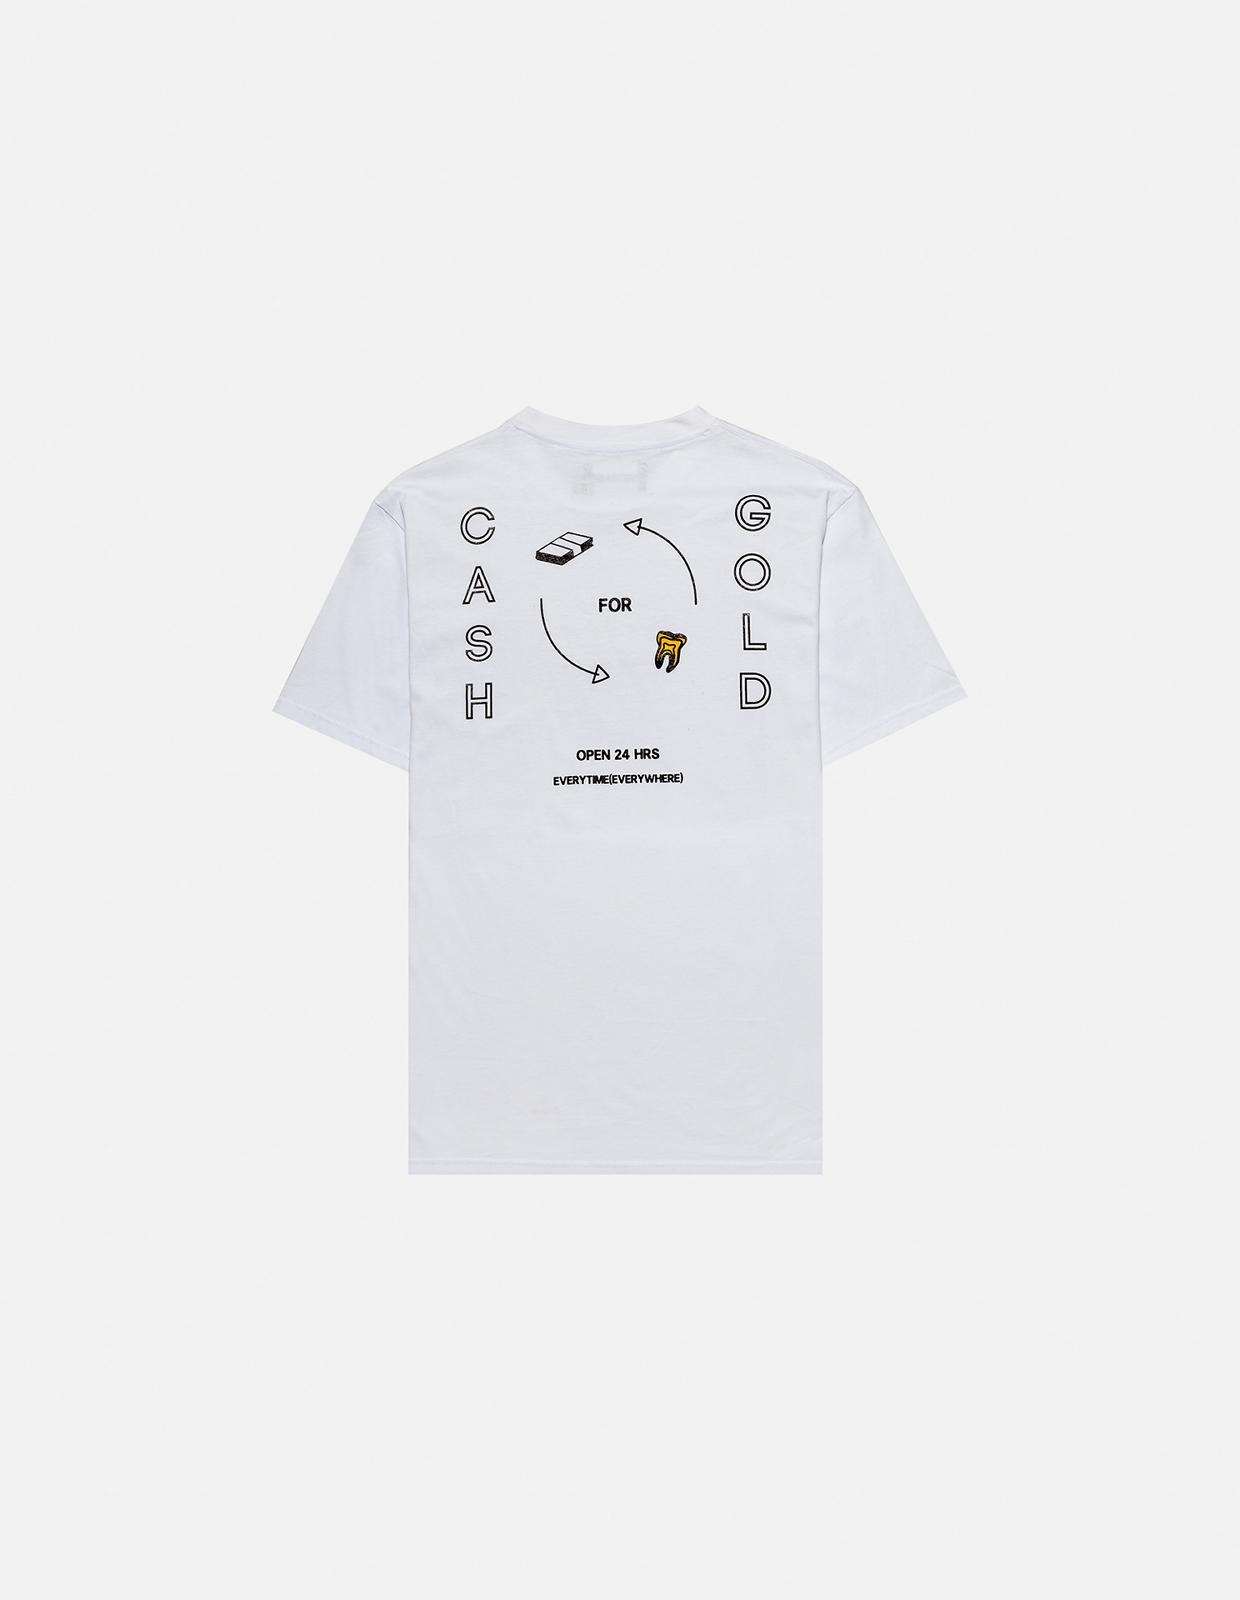 【PAS DE MER/パドゥメ】CASHGOLD T-SHIRT Tシャツ / WHITE